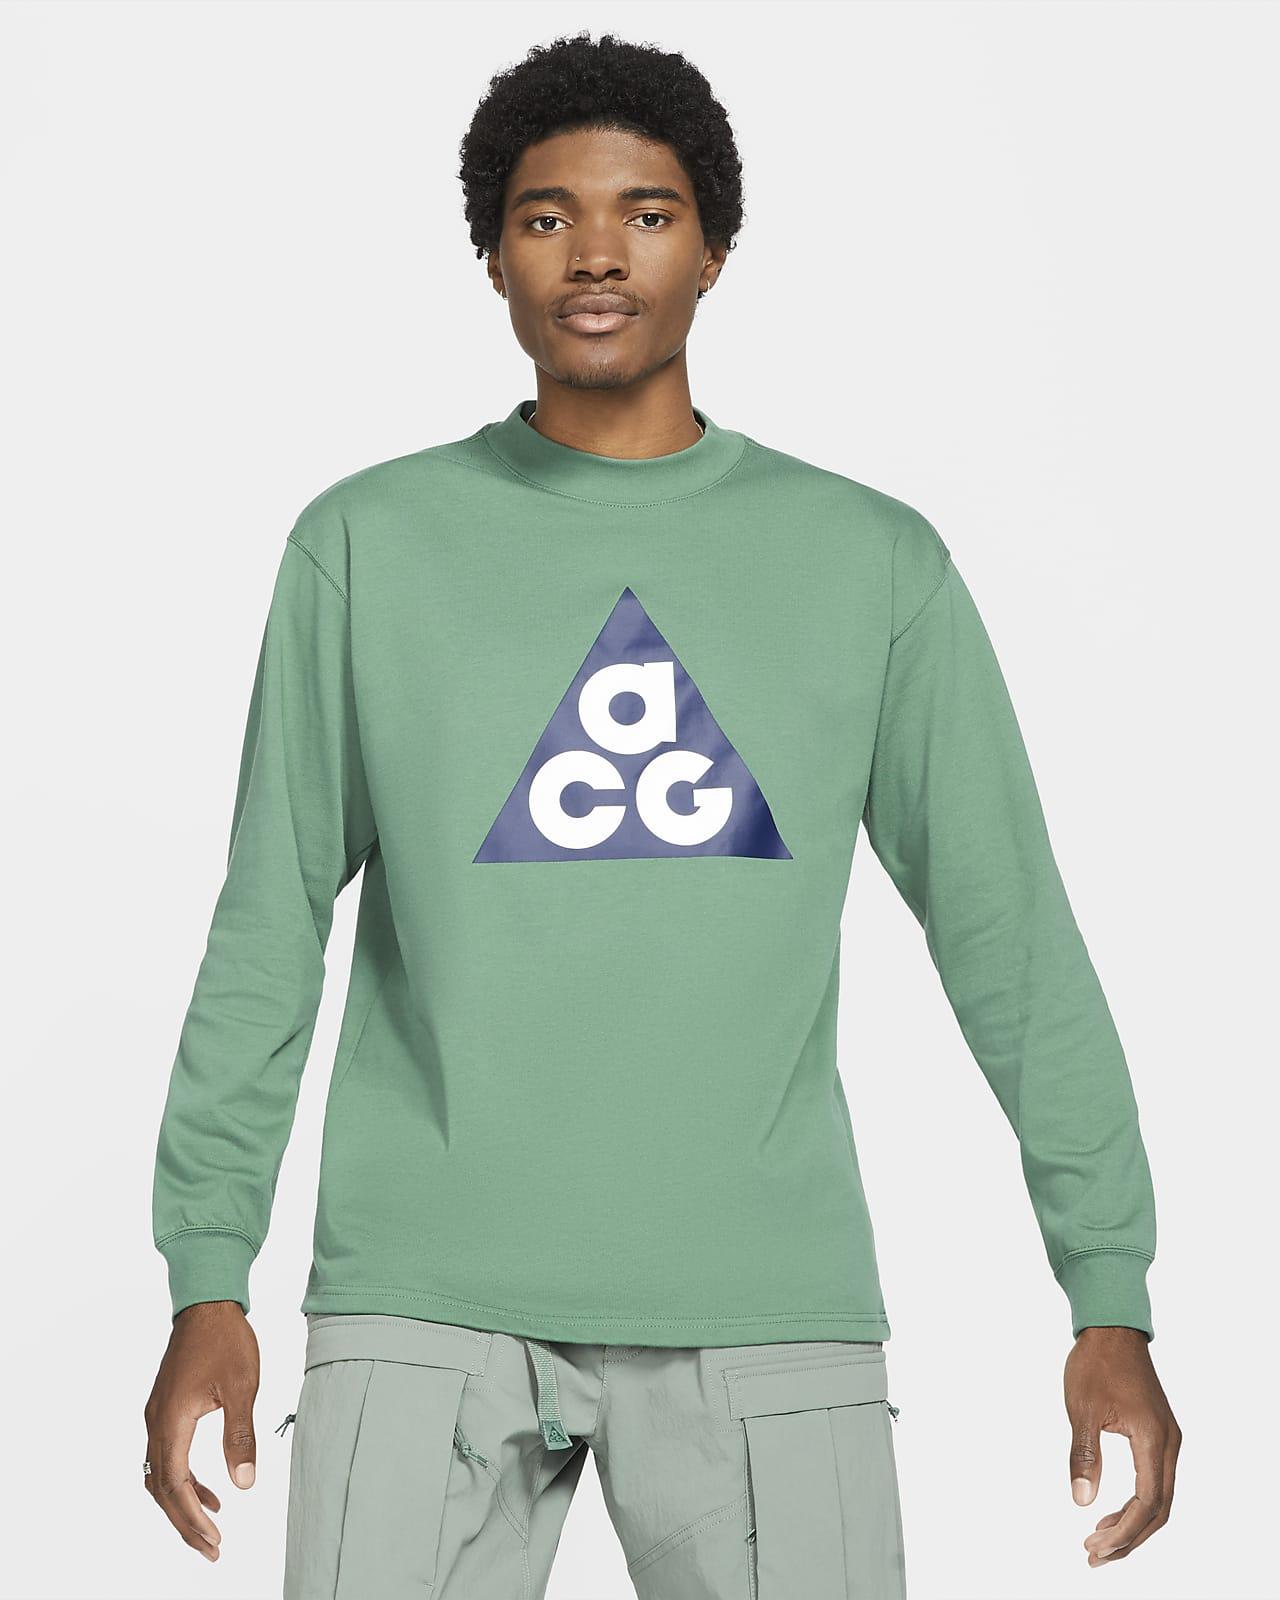 Nike ACG Men's Long-Sleeve T-Shirt